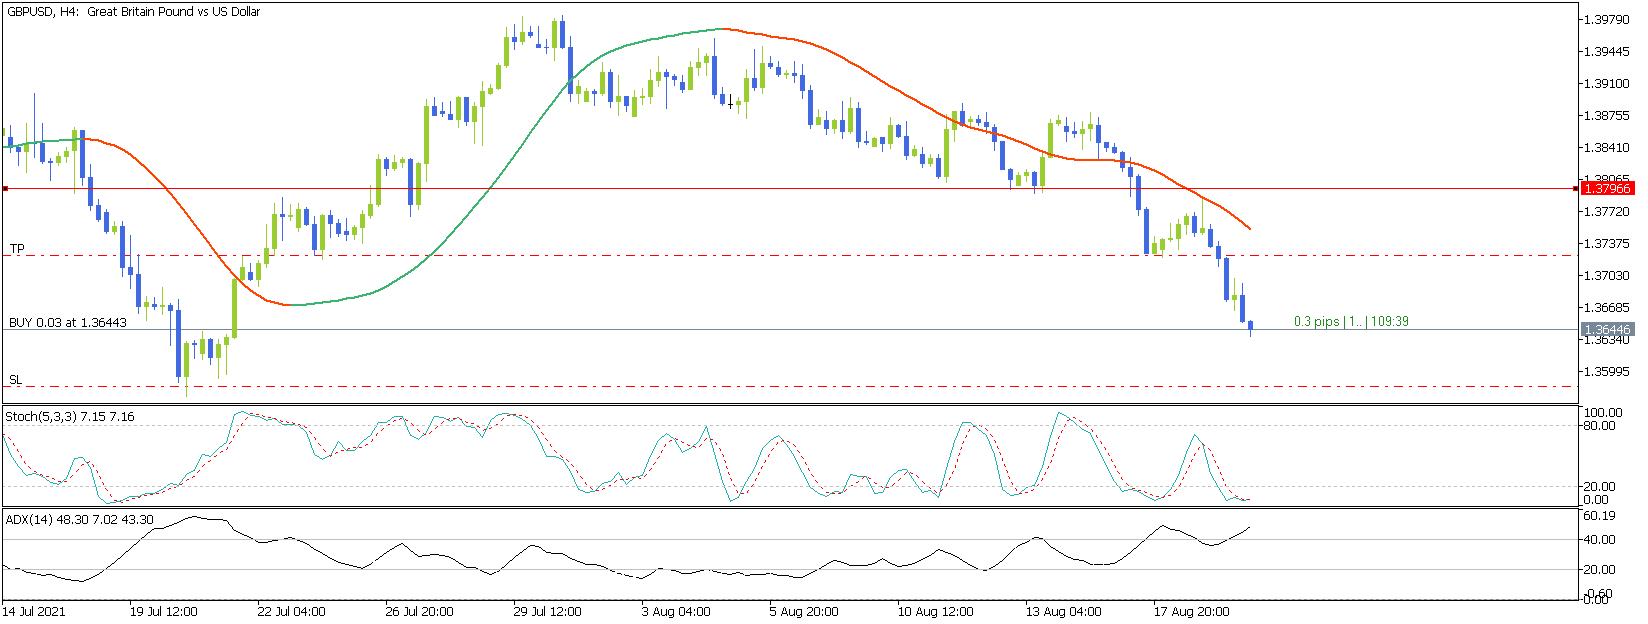 EUR/USD M1 Demand, Price Action, Indicators